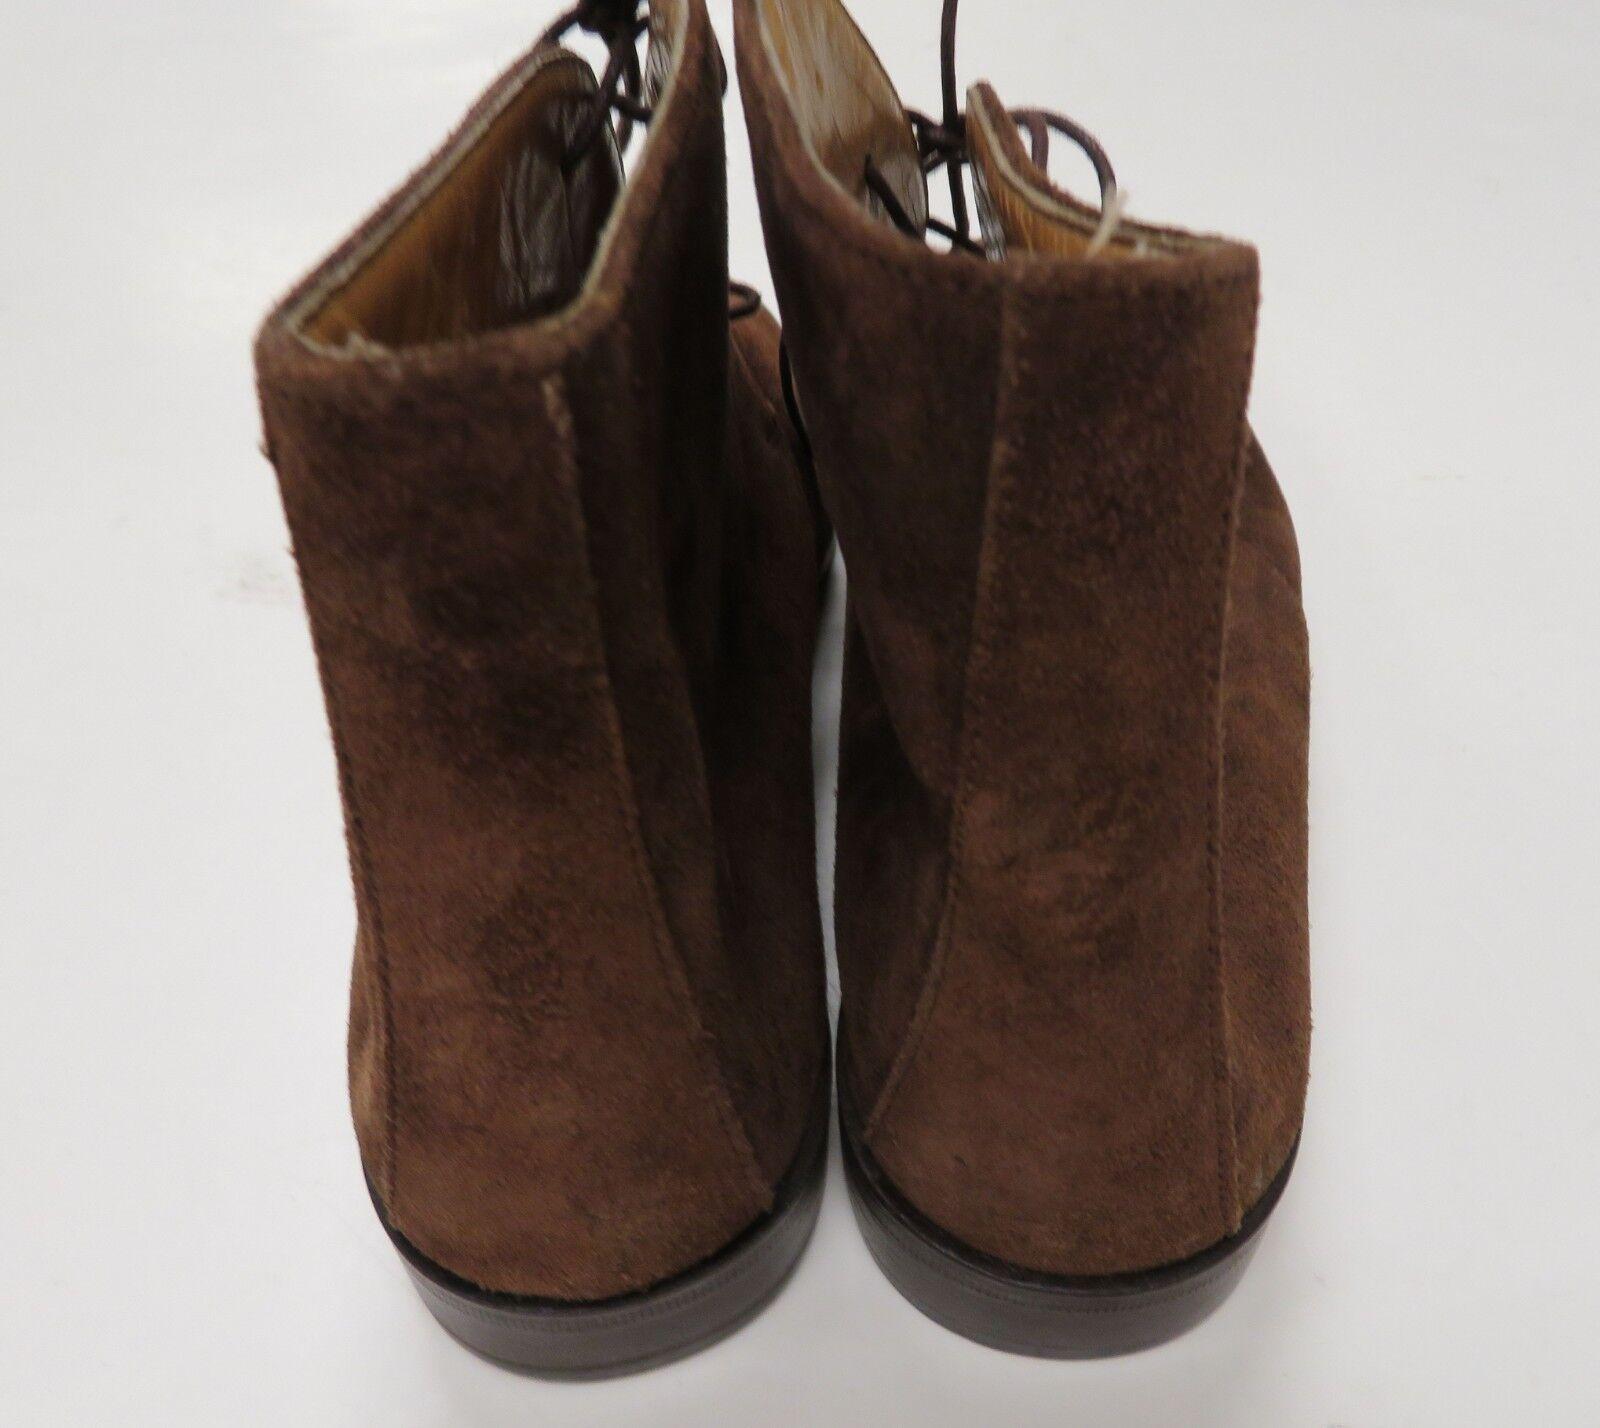 Brooks Brothers Leder Braun Chukka Stiefel Suede Leder Brothers 6 1/2 B Made in  b152ec